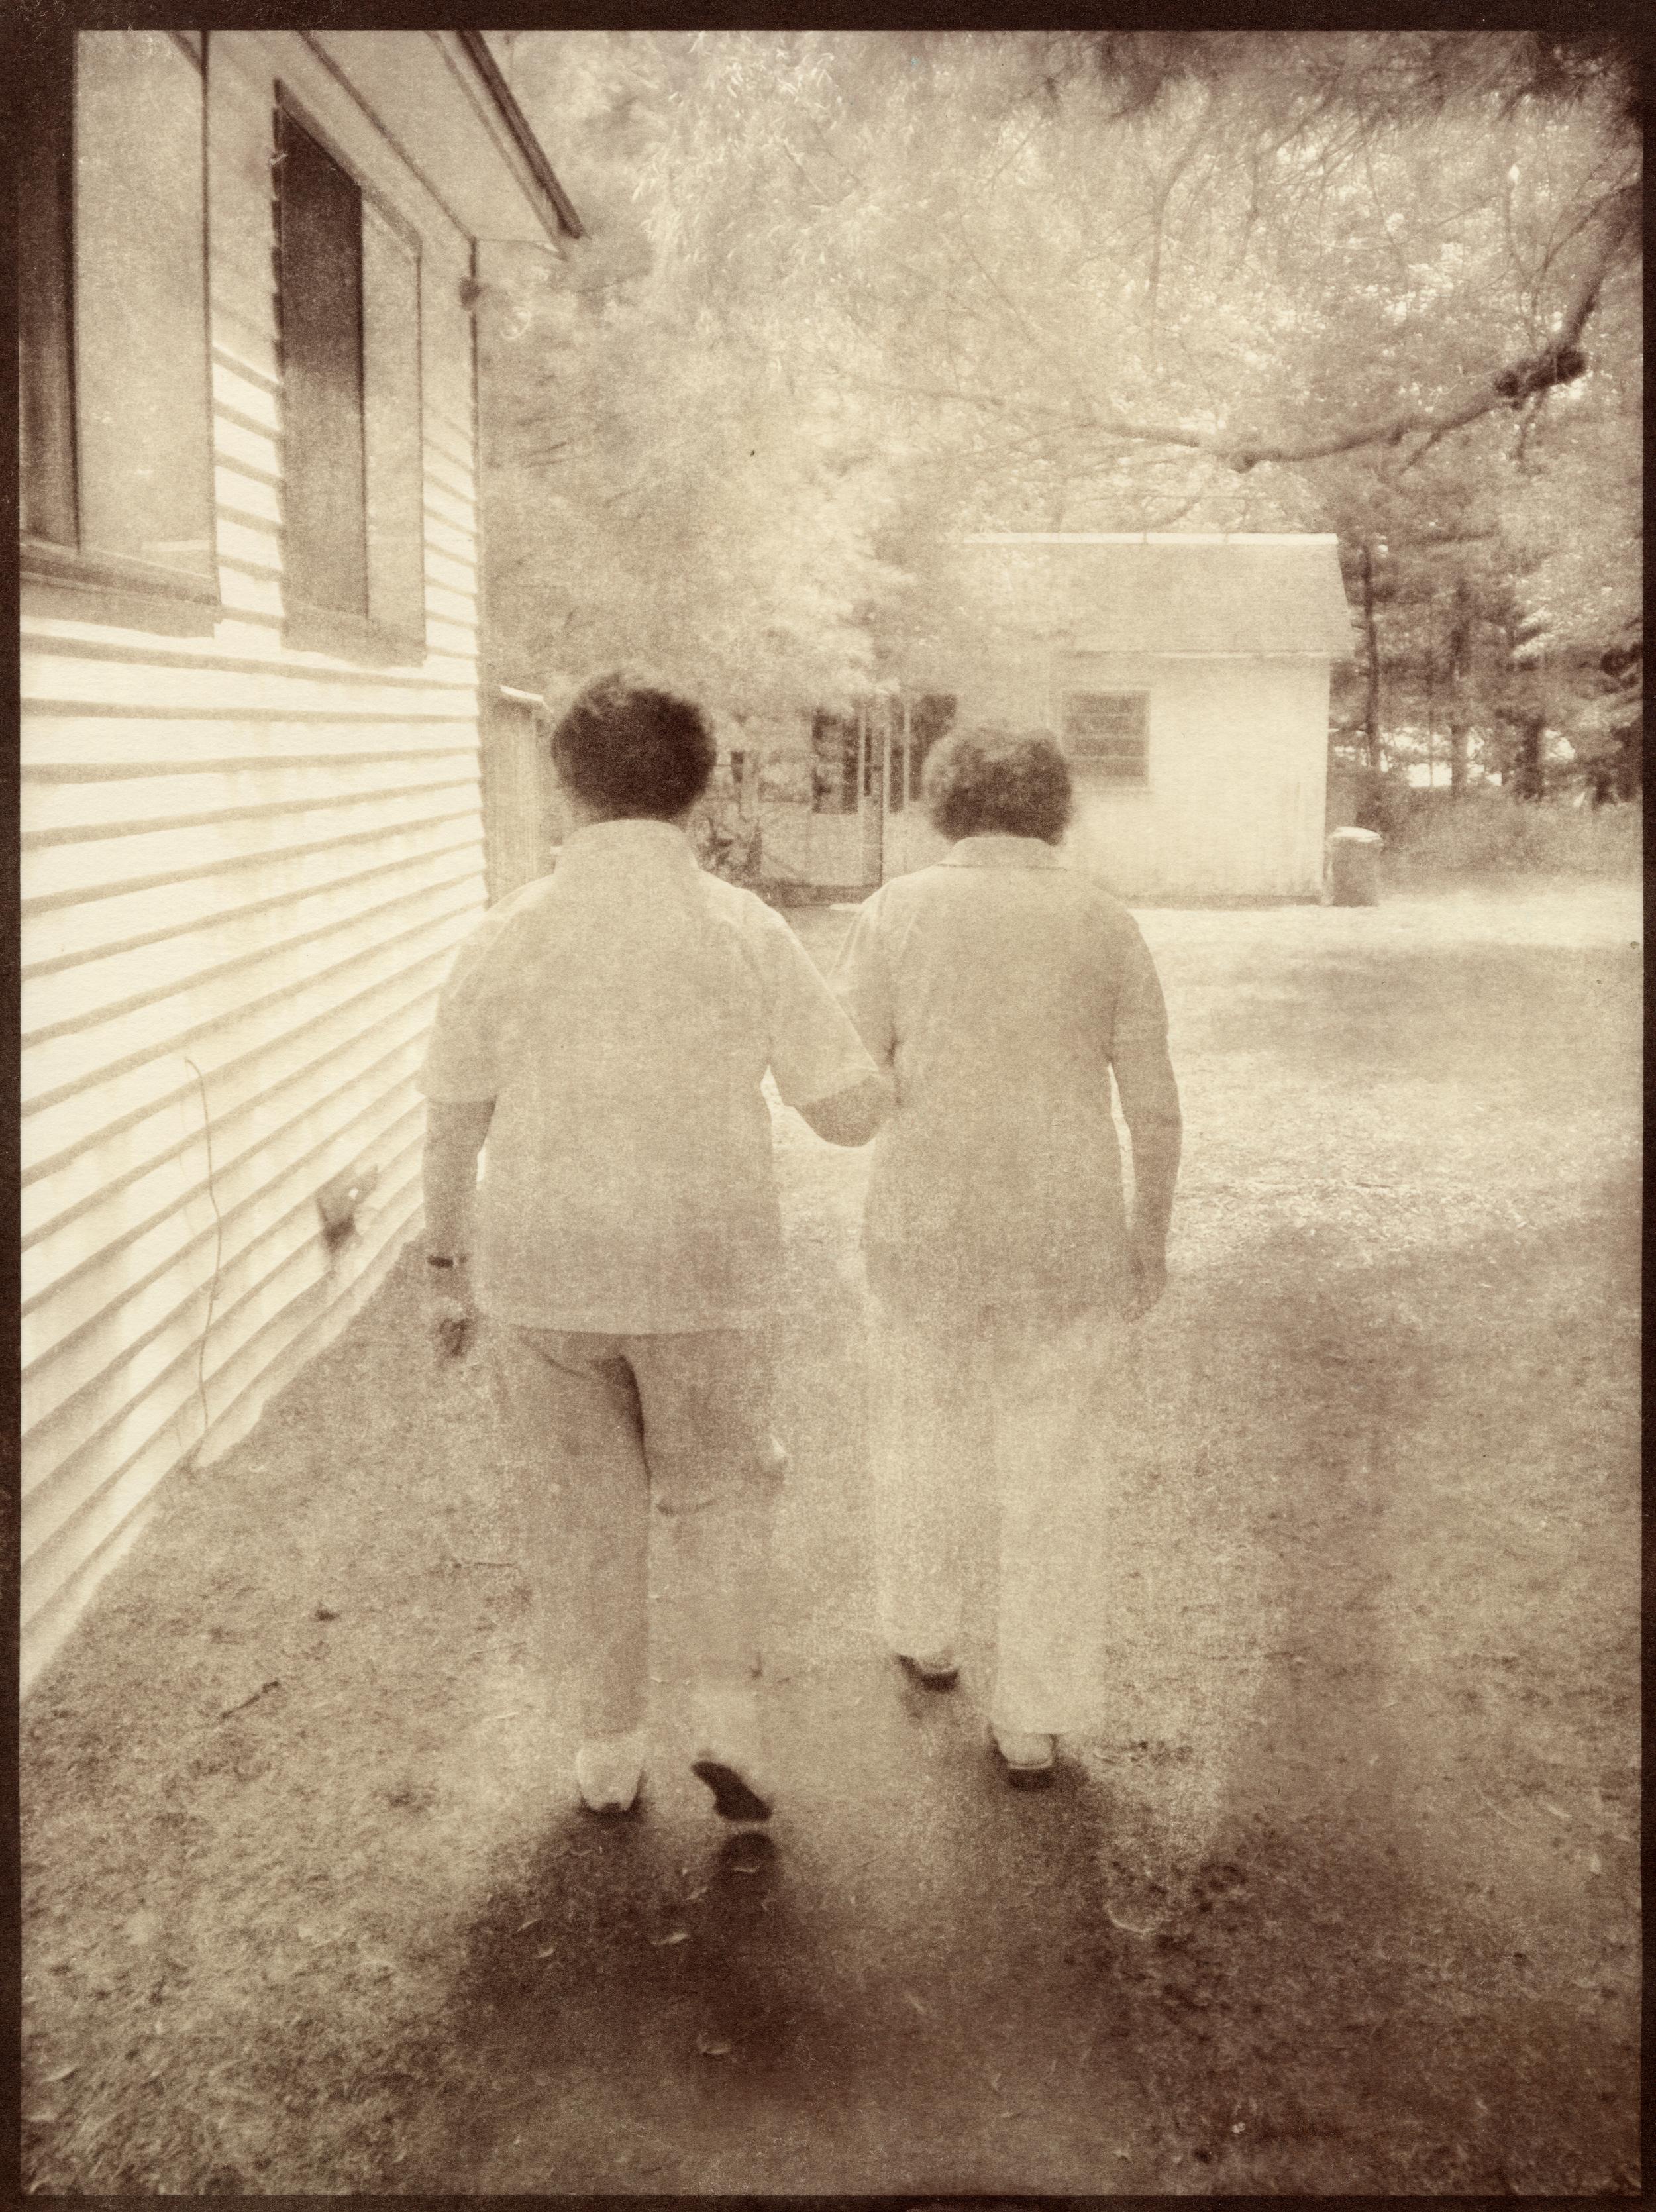 Survivors, The Catskills, 2009, Van Dyke Print